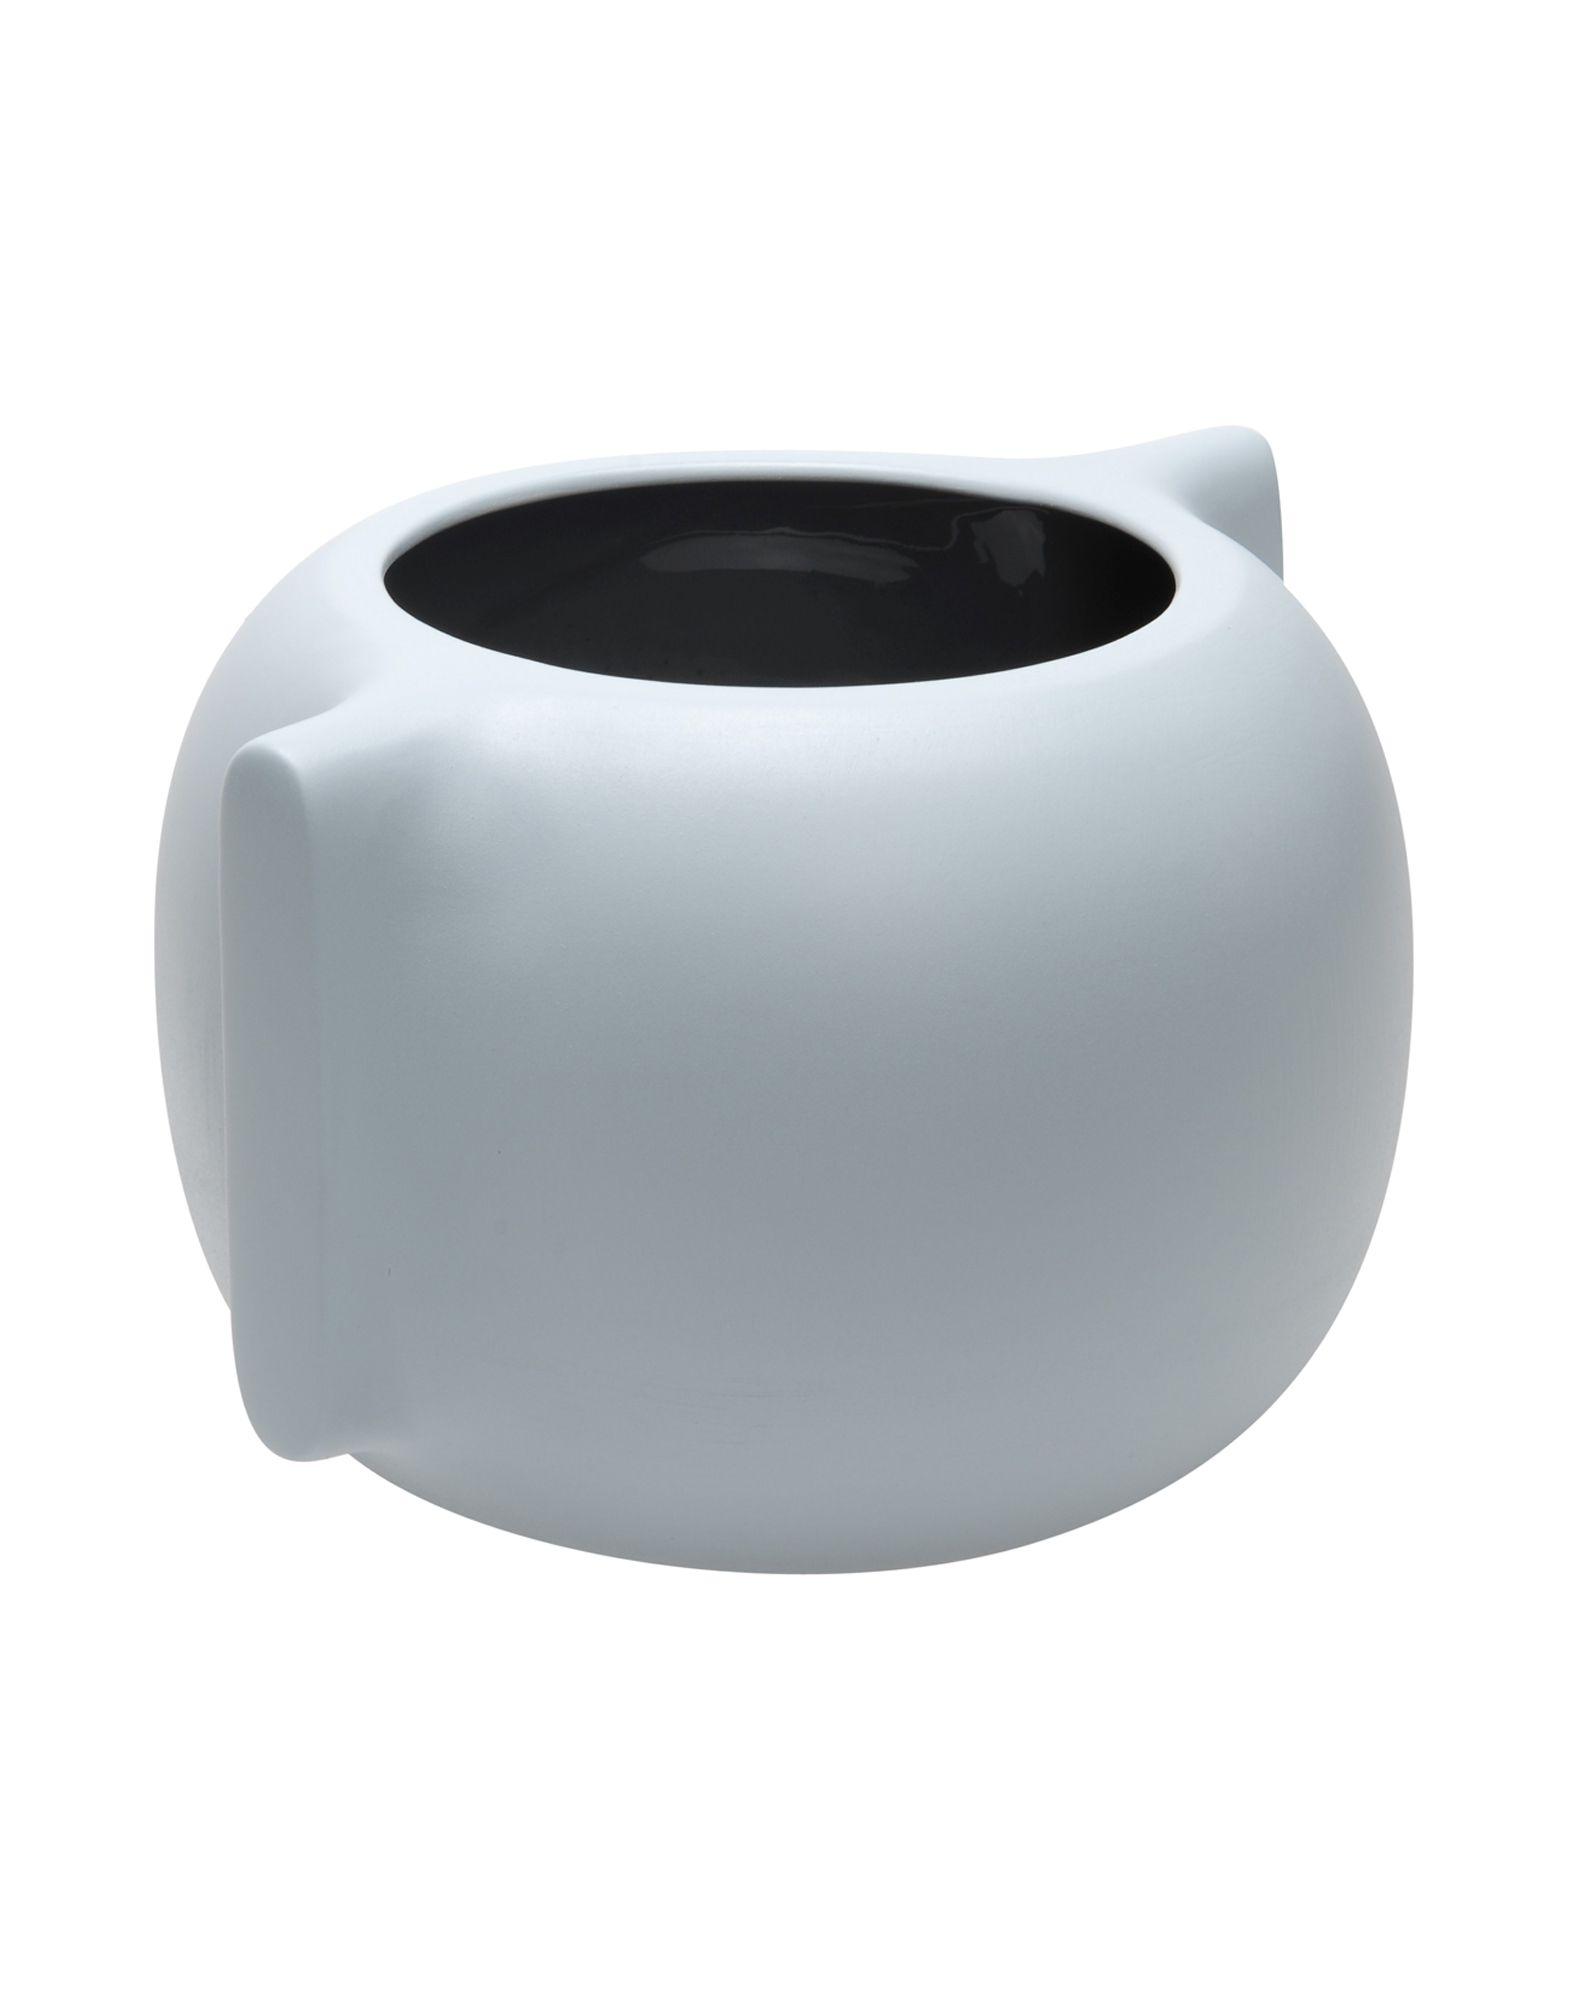 Incipit incipit complementi d 39 arredo vasi on yoox for Complementi d arredo vasi